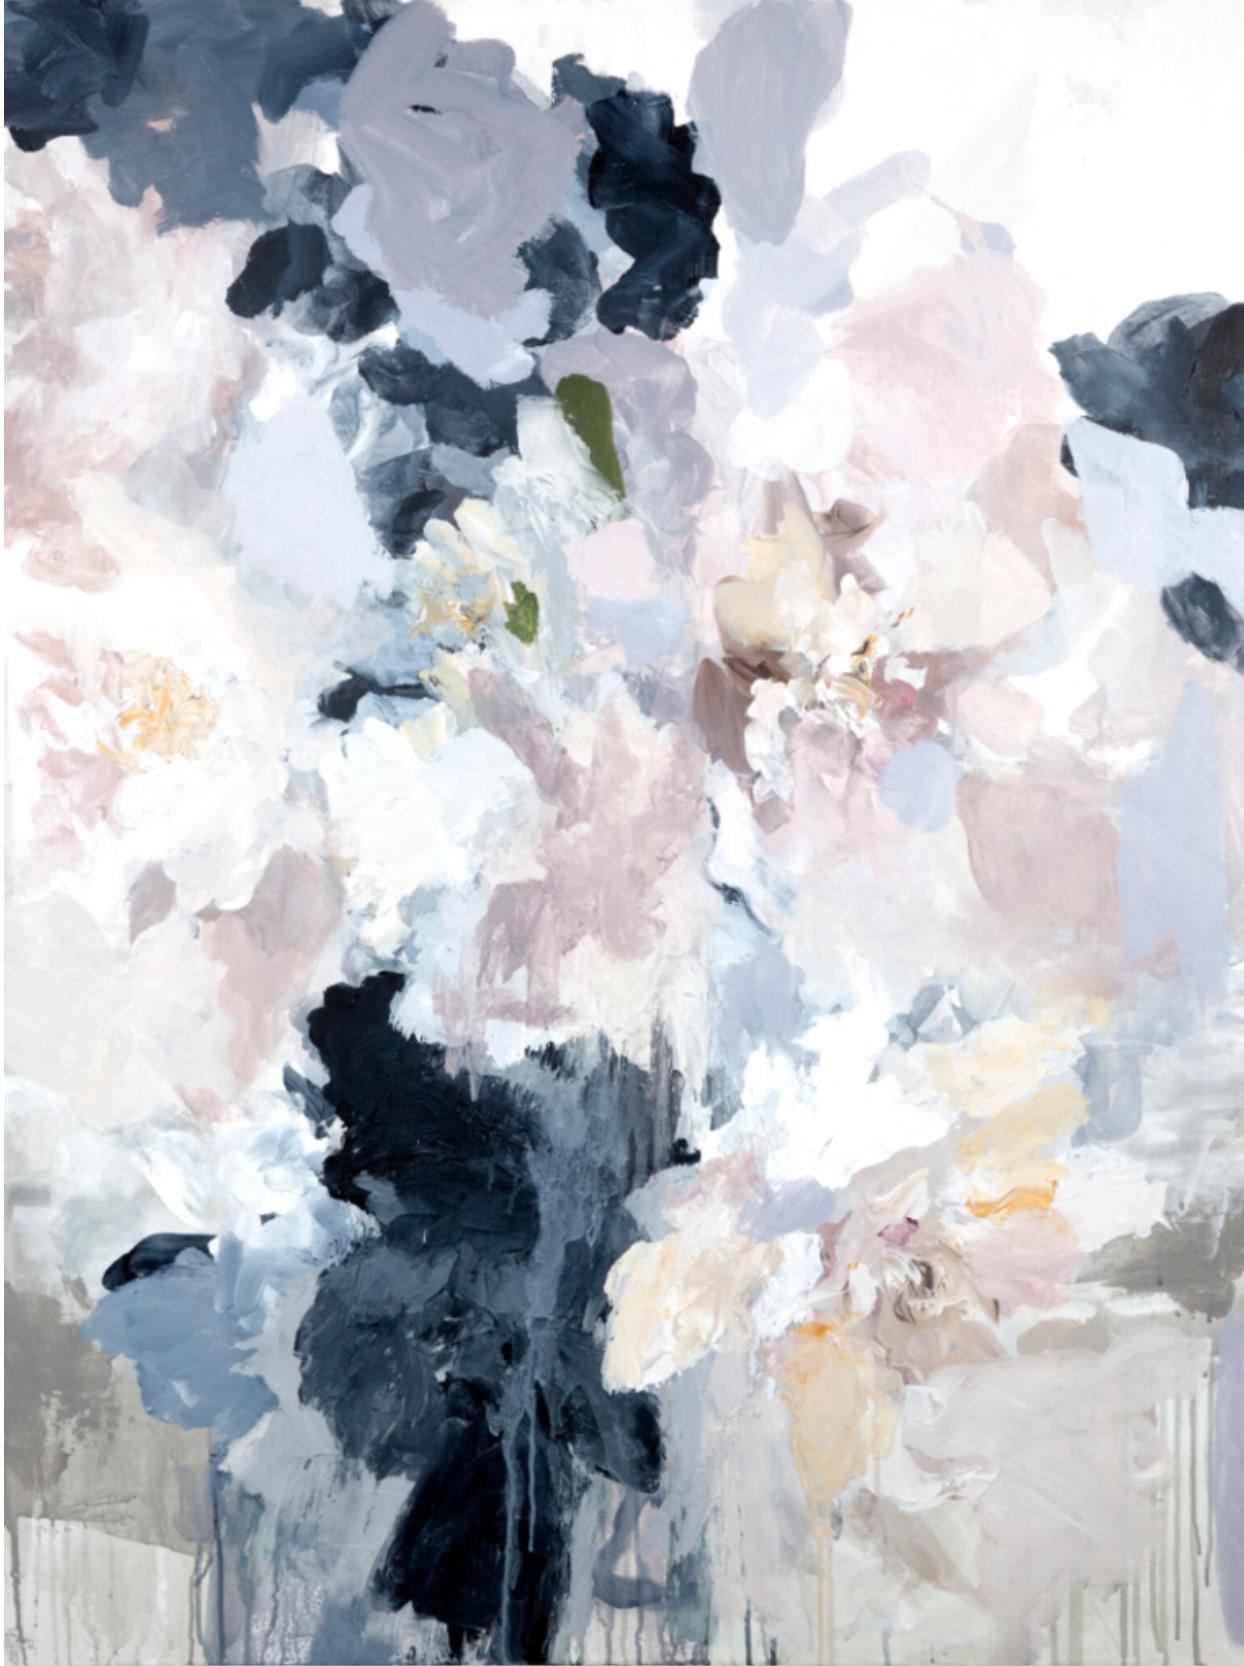 """Garden Gate"" by Mia Malcolm"